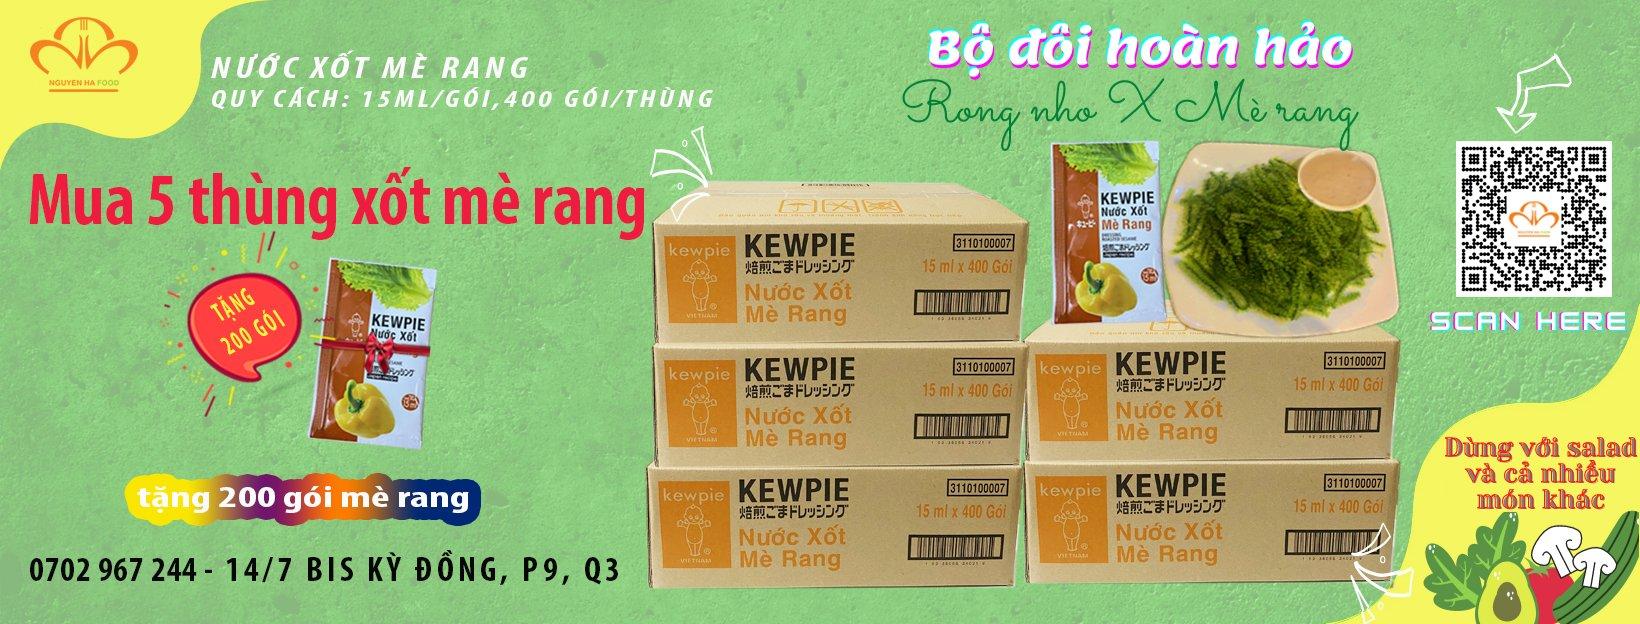 banner ctkm xot me rang kewpie 15ml nguyen ha food